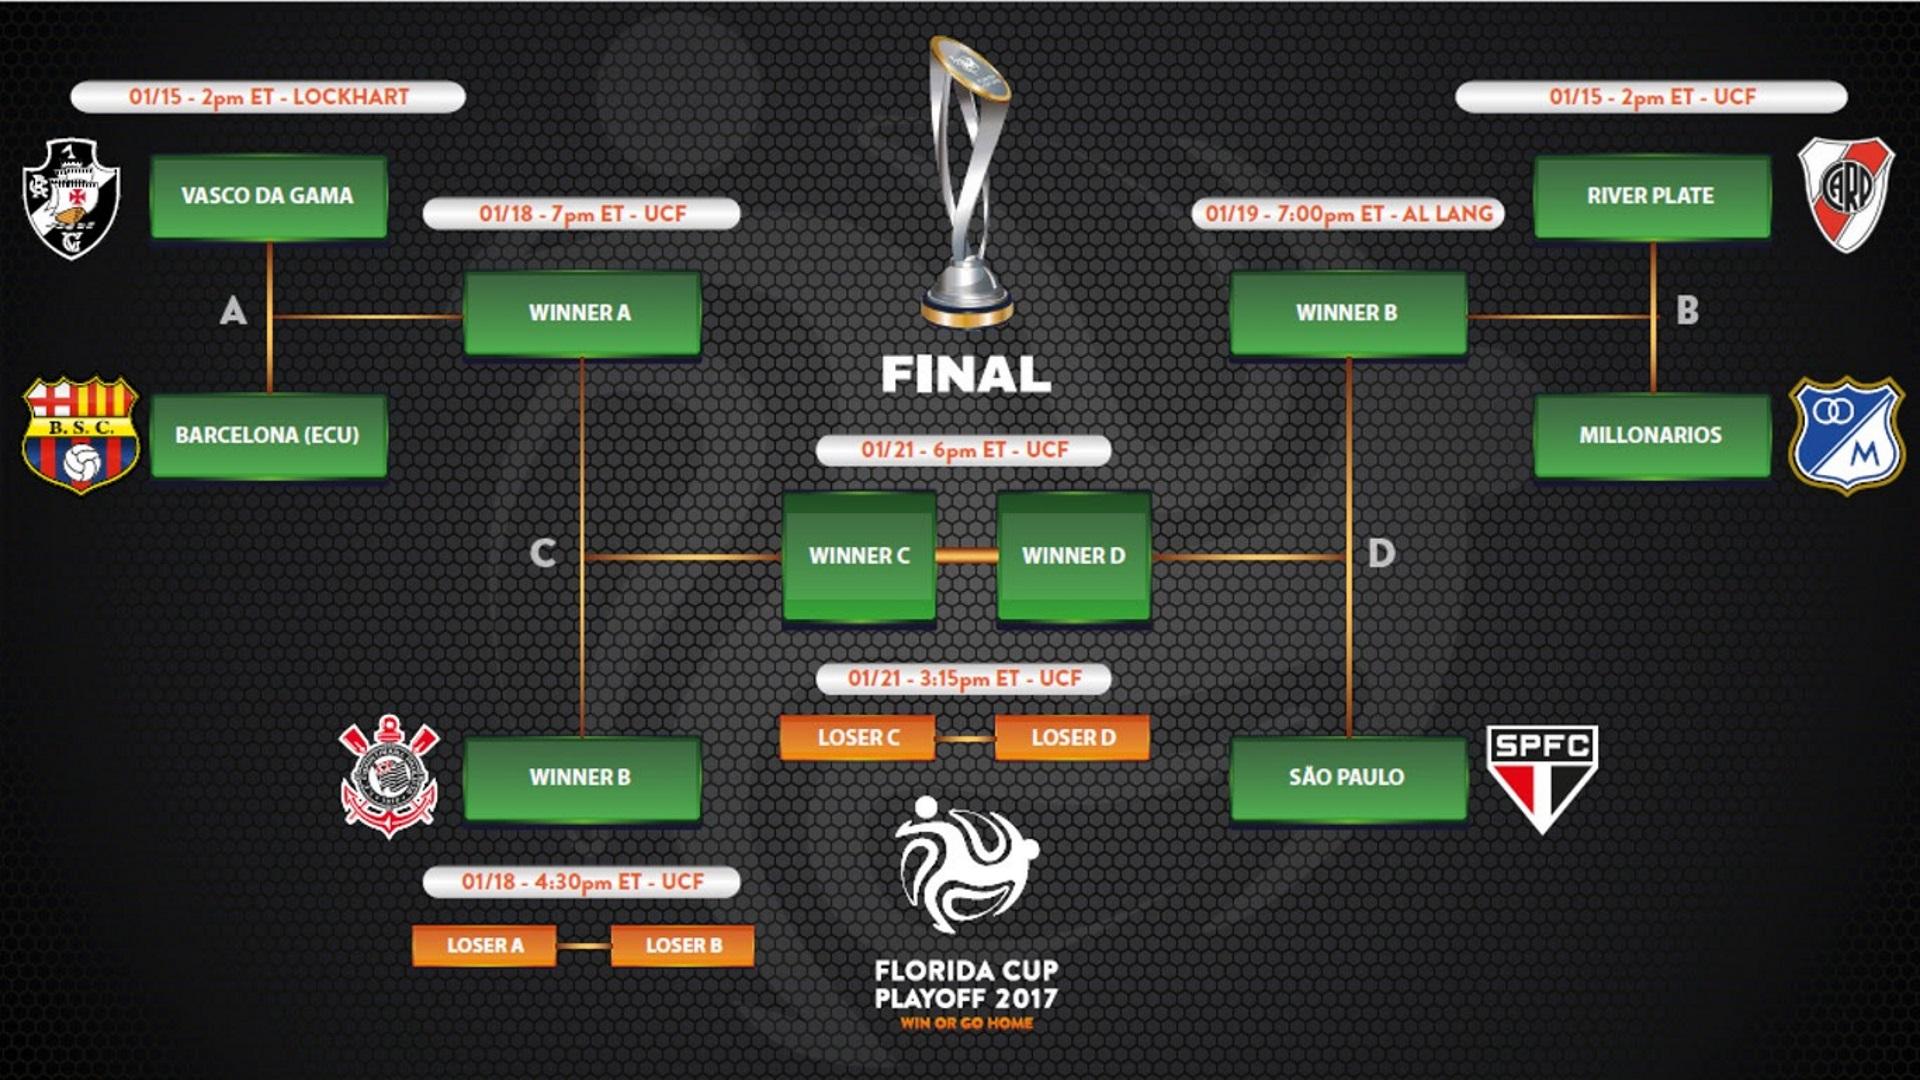 http://images.performgroup.com/di/library/Goal_Brasil/0/e5/tabela-playoff-florida-cup-15-12-2016_zxnn1iqmgm9c1isew7z3esve8.jpg